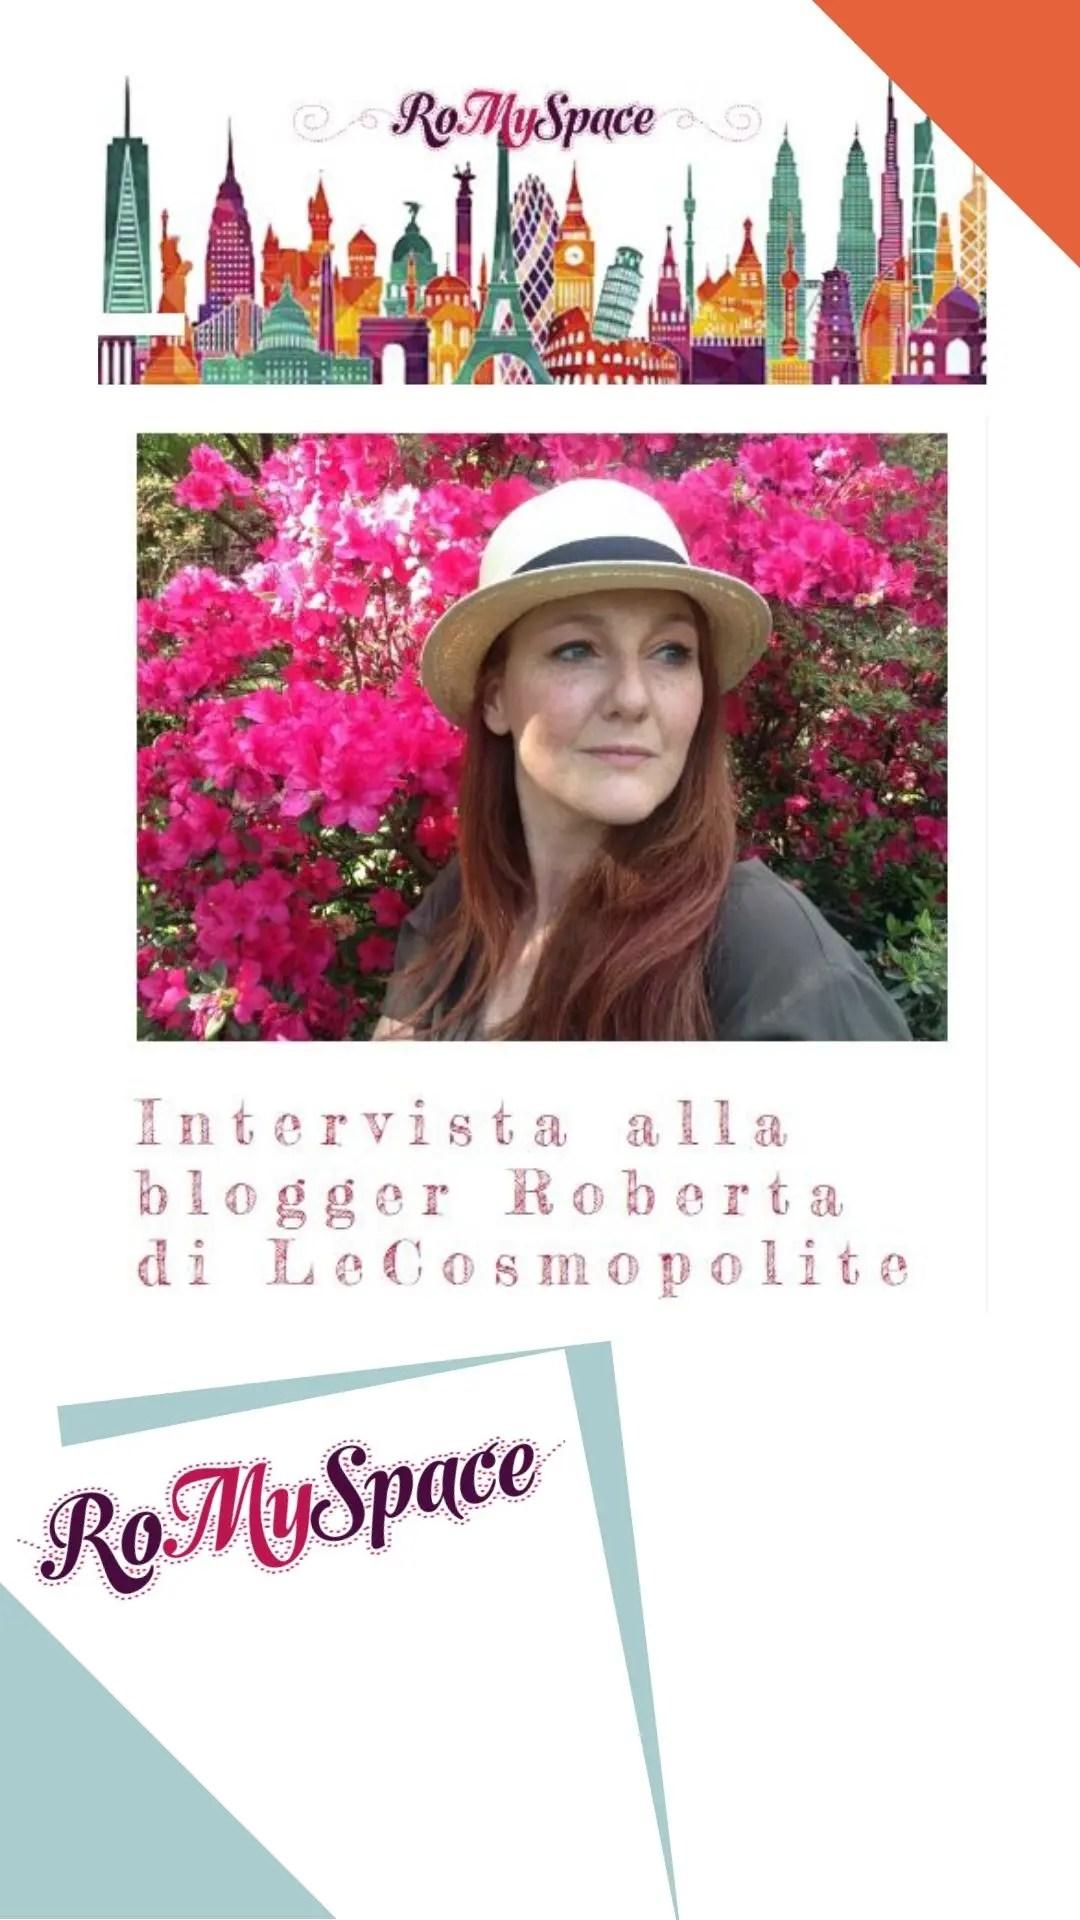 Roberta Ferrazzi, travel blogger veneta, intervista di Romyspace